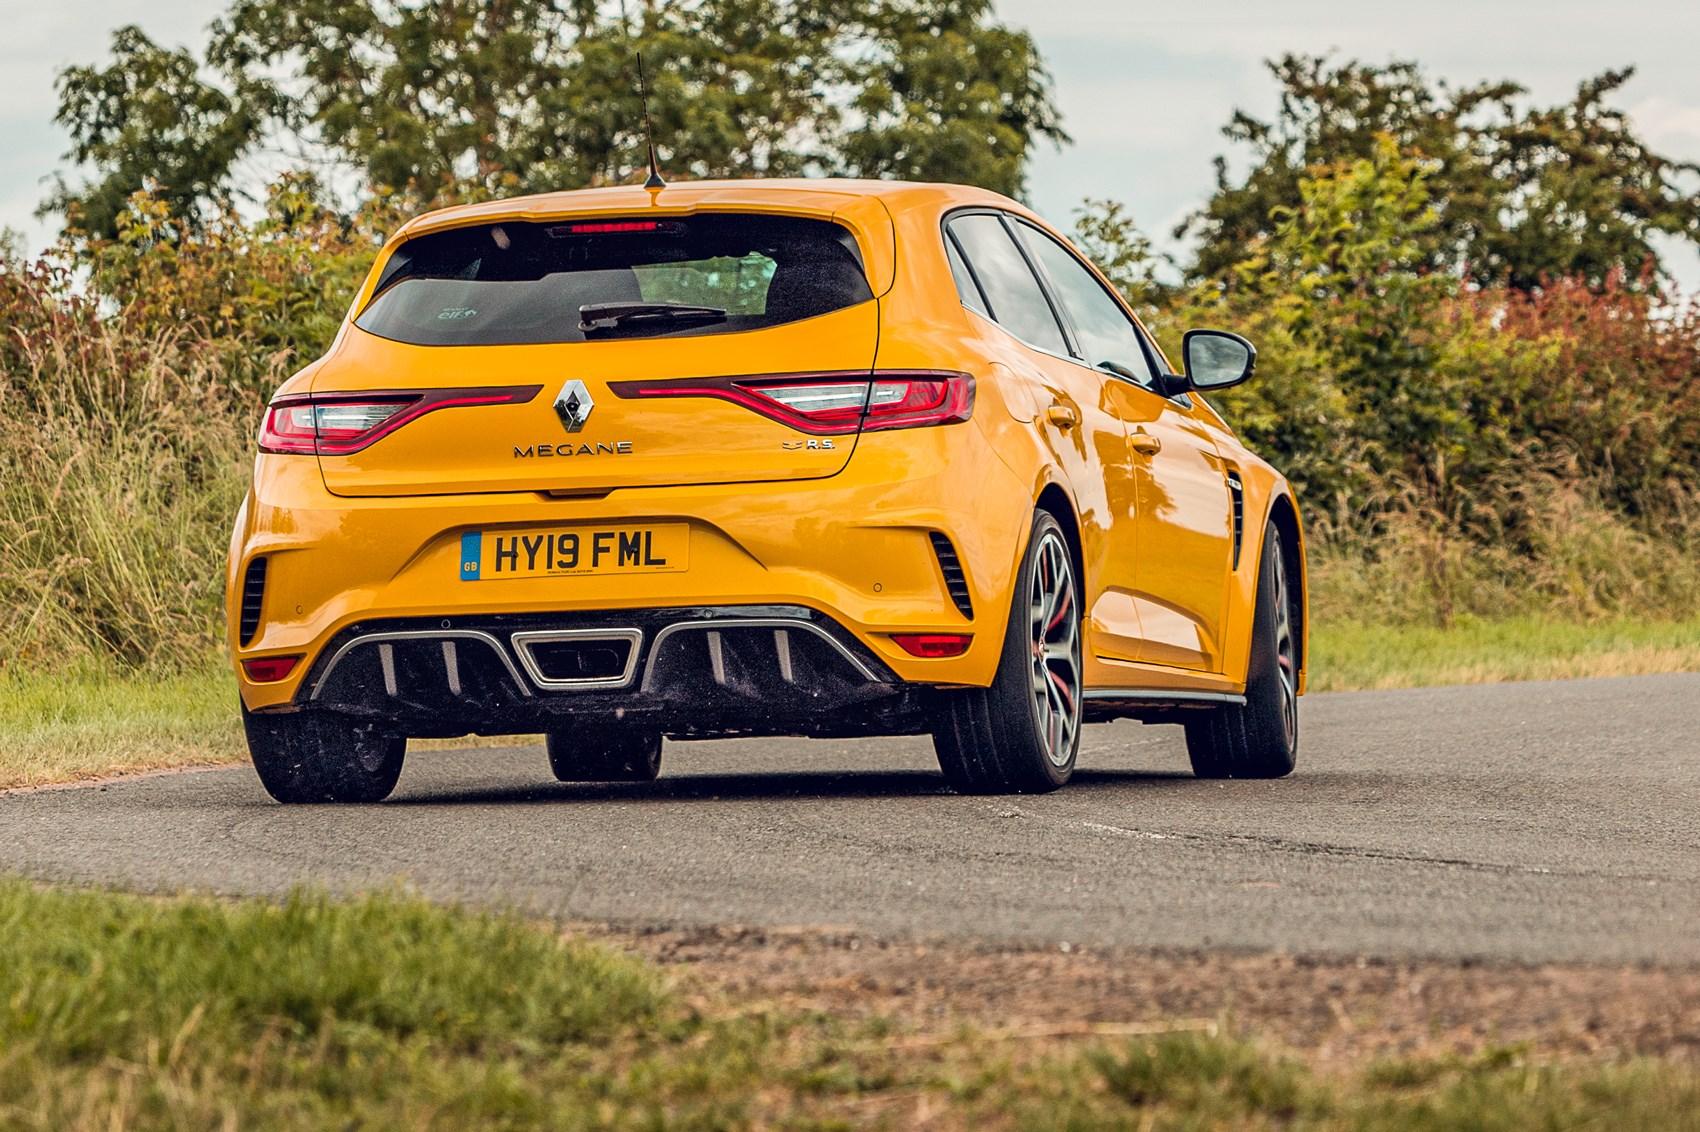 Renault Megane Rs 300 Trophy 2020 Long Term Test Review Car Magazine